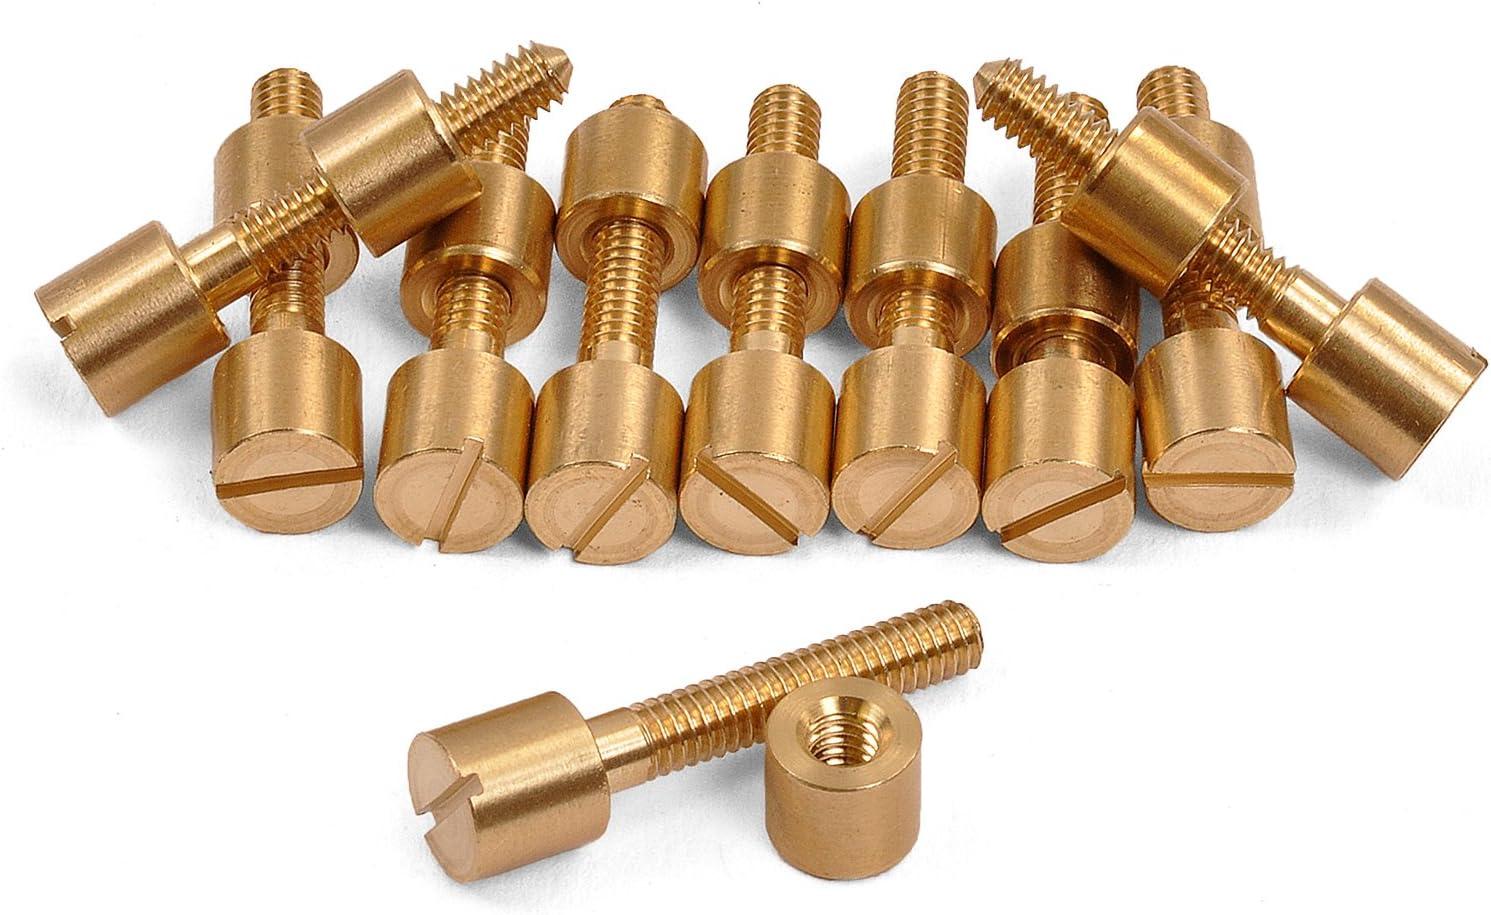 5//16 Diameter Head 10 Pack of Brass Screw Fasteners 600B